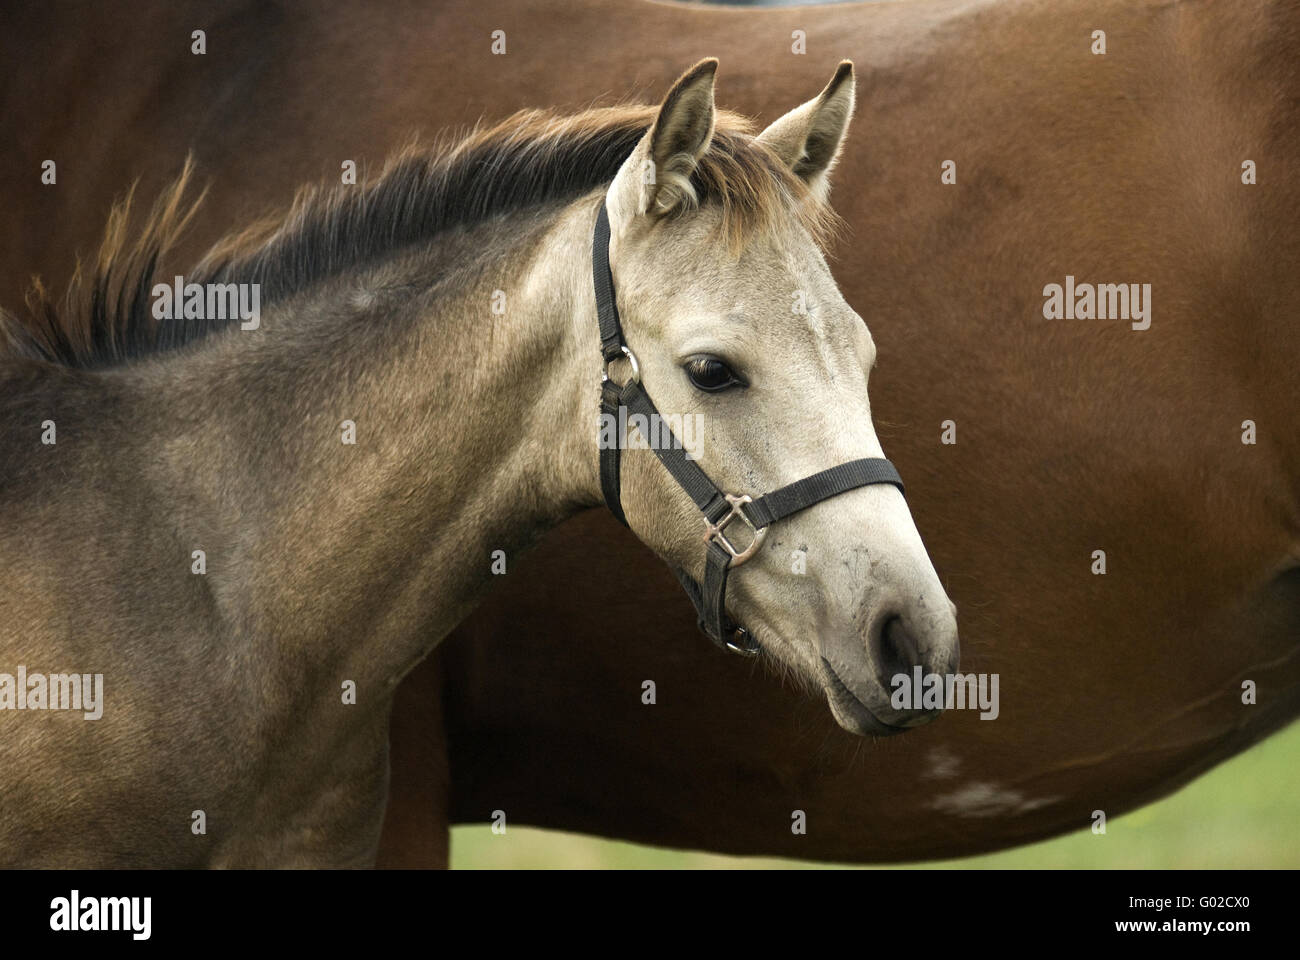 foal, stallion - Stock Image